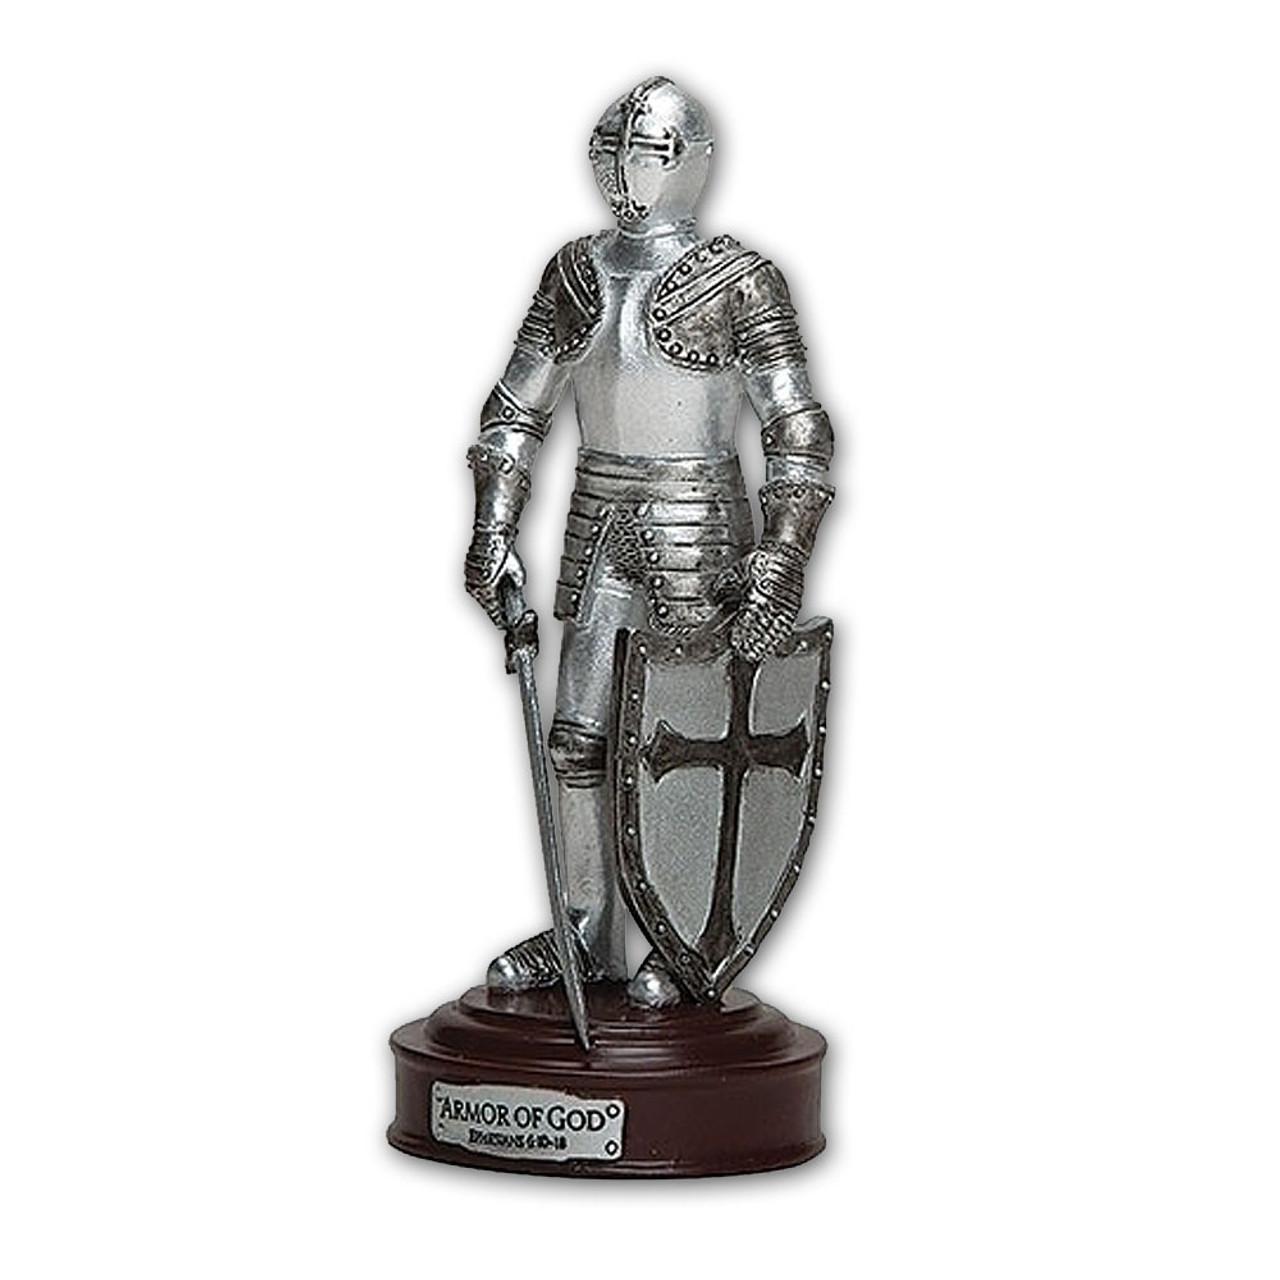 Armor of God Statuette